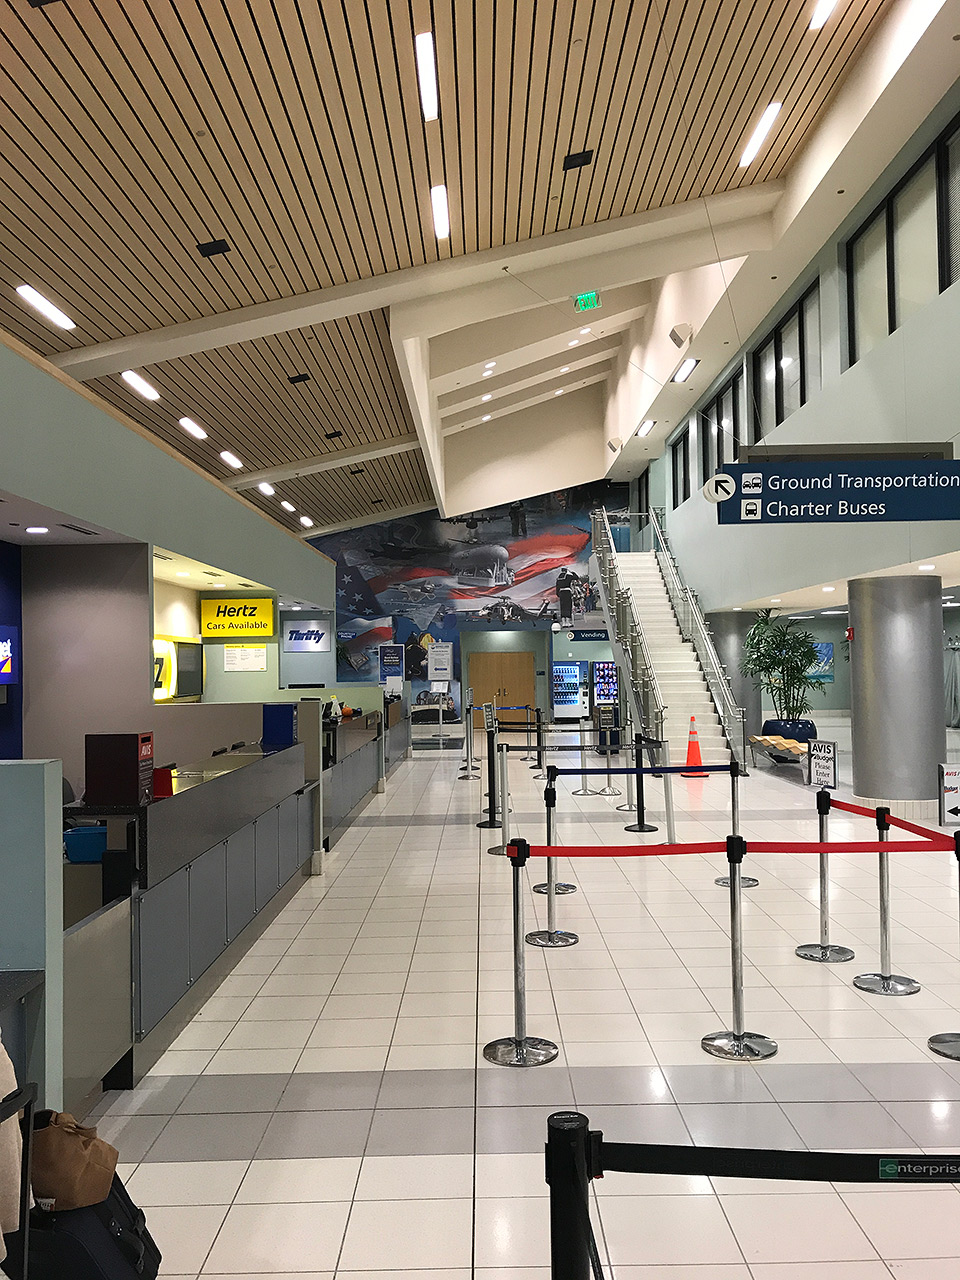 171021-panama-city-airport